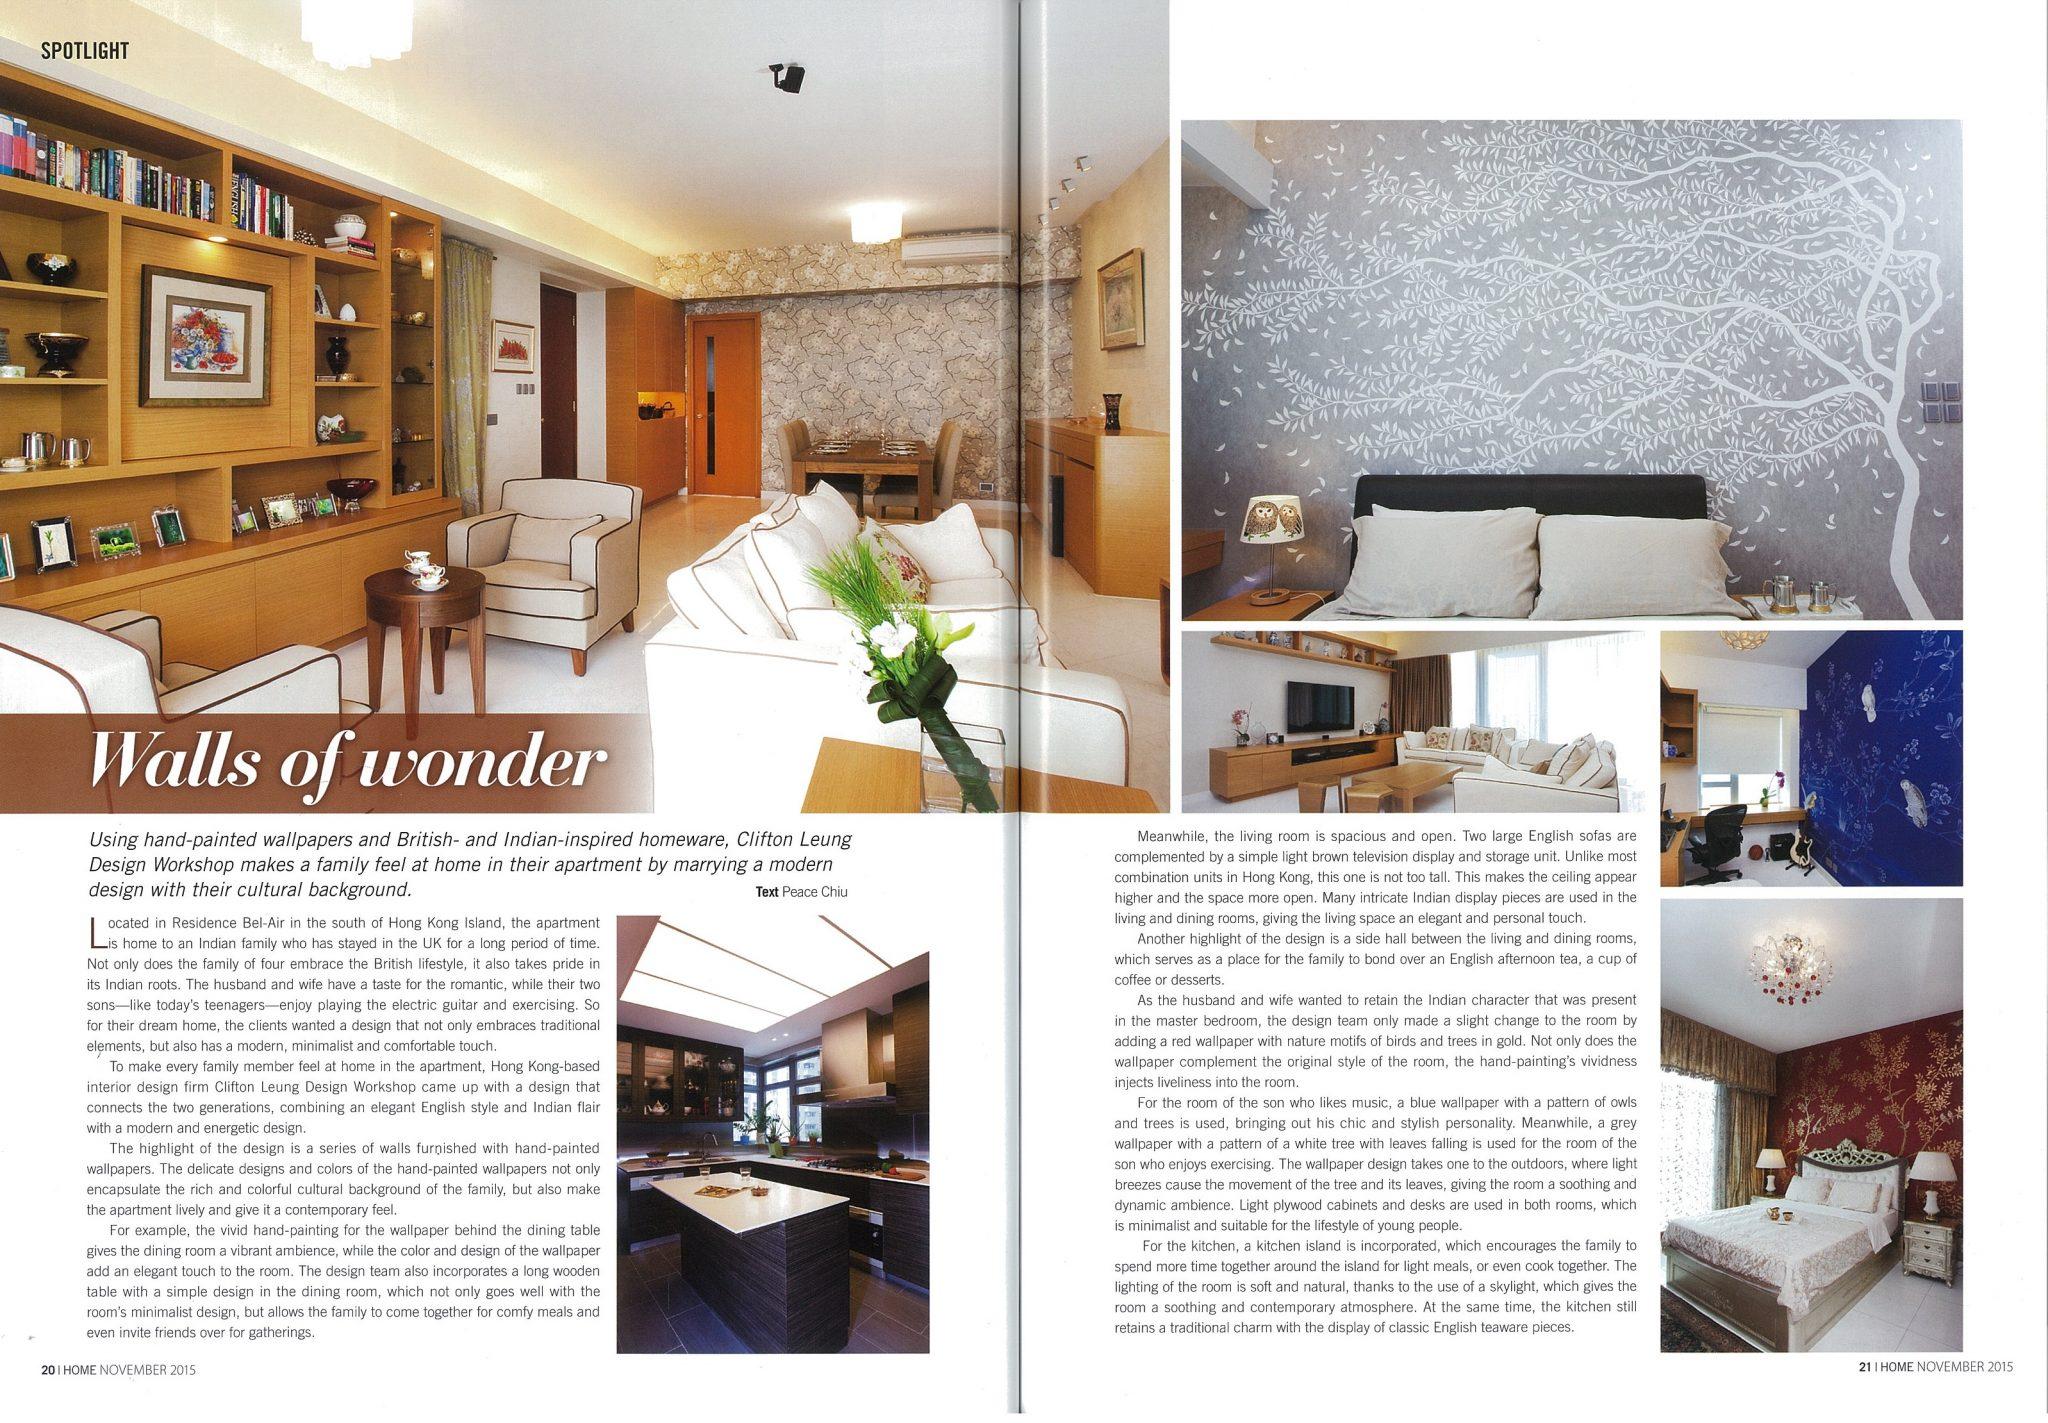 home design | Clifton Leung Design Workshop | 智設計工房 - Part 3